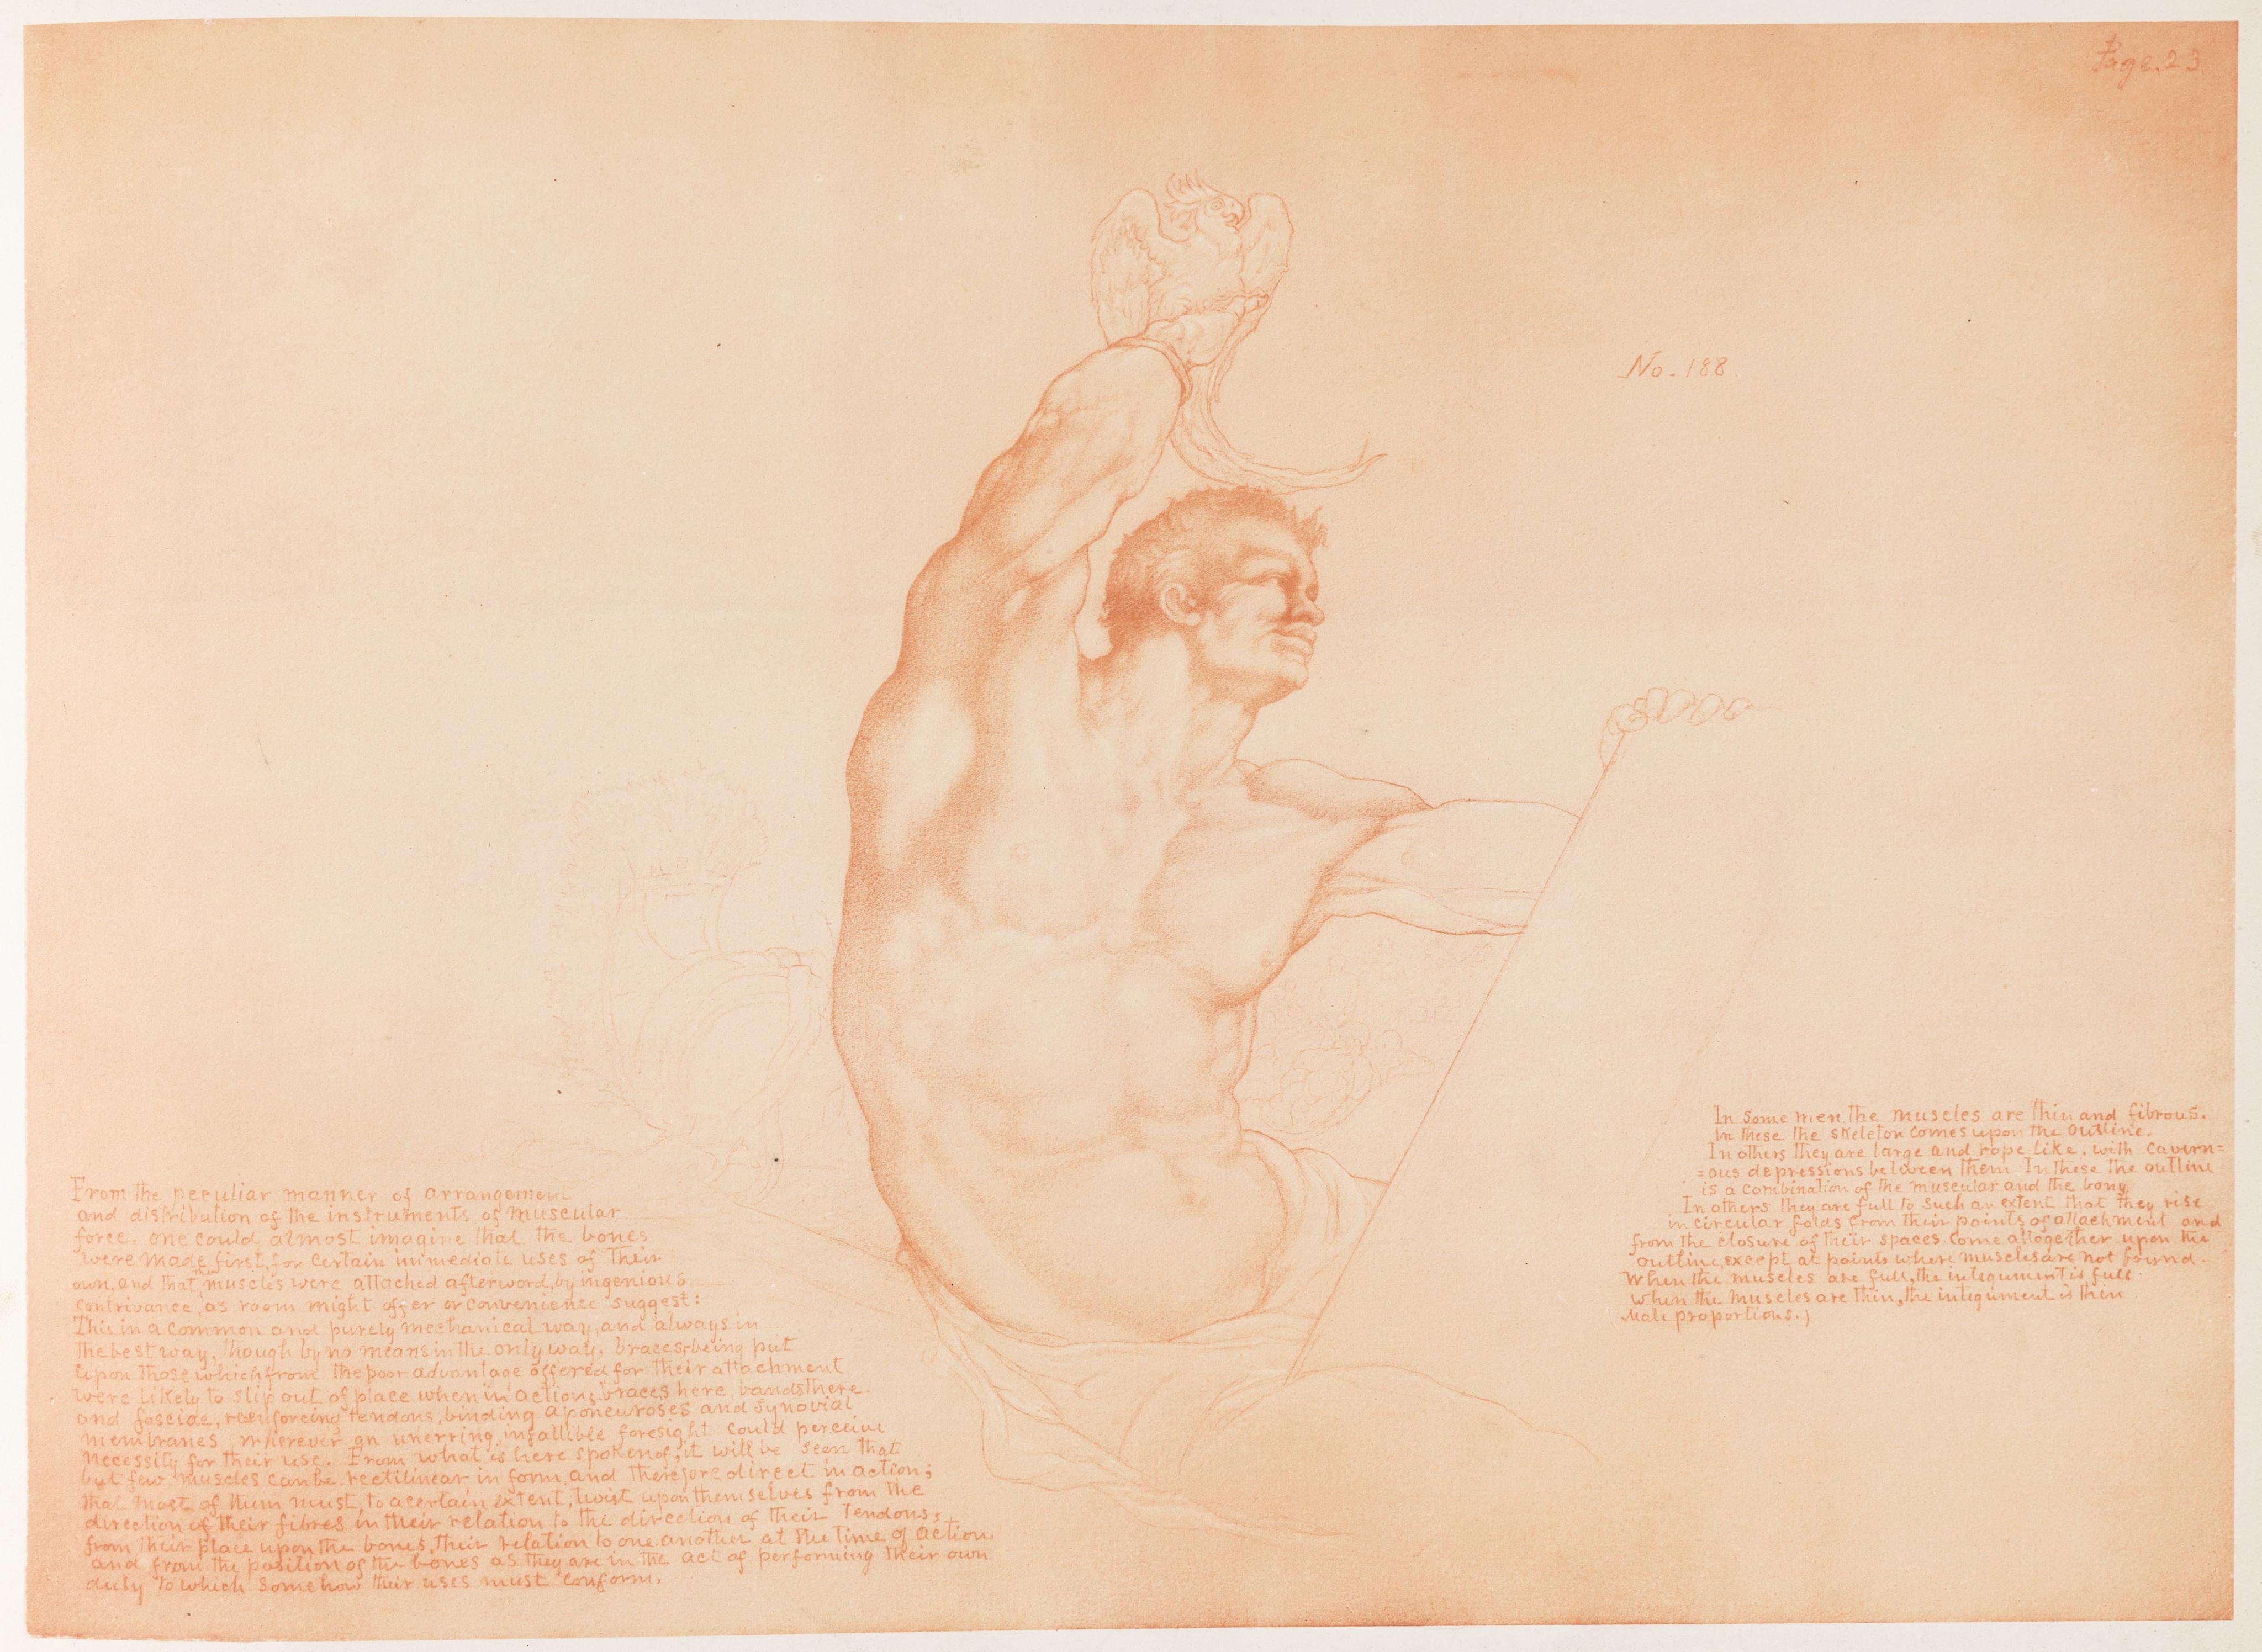 Filebook Illustration Art Anatomy Pectoralis Major In Use 1884